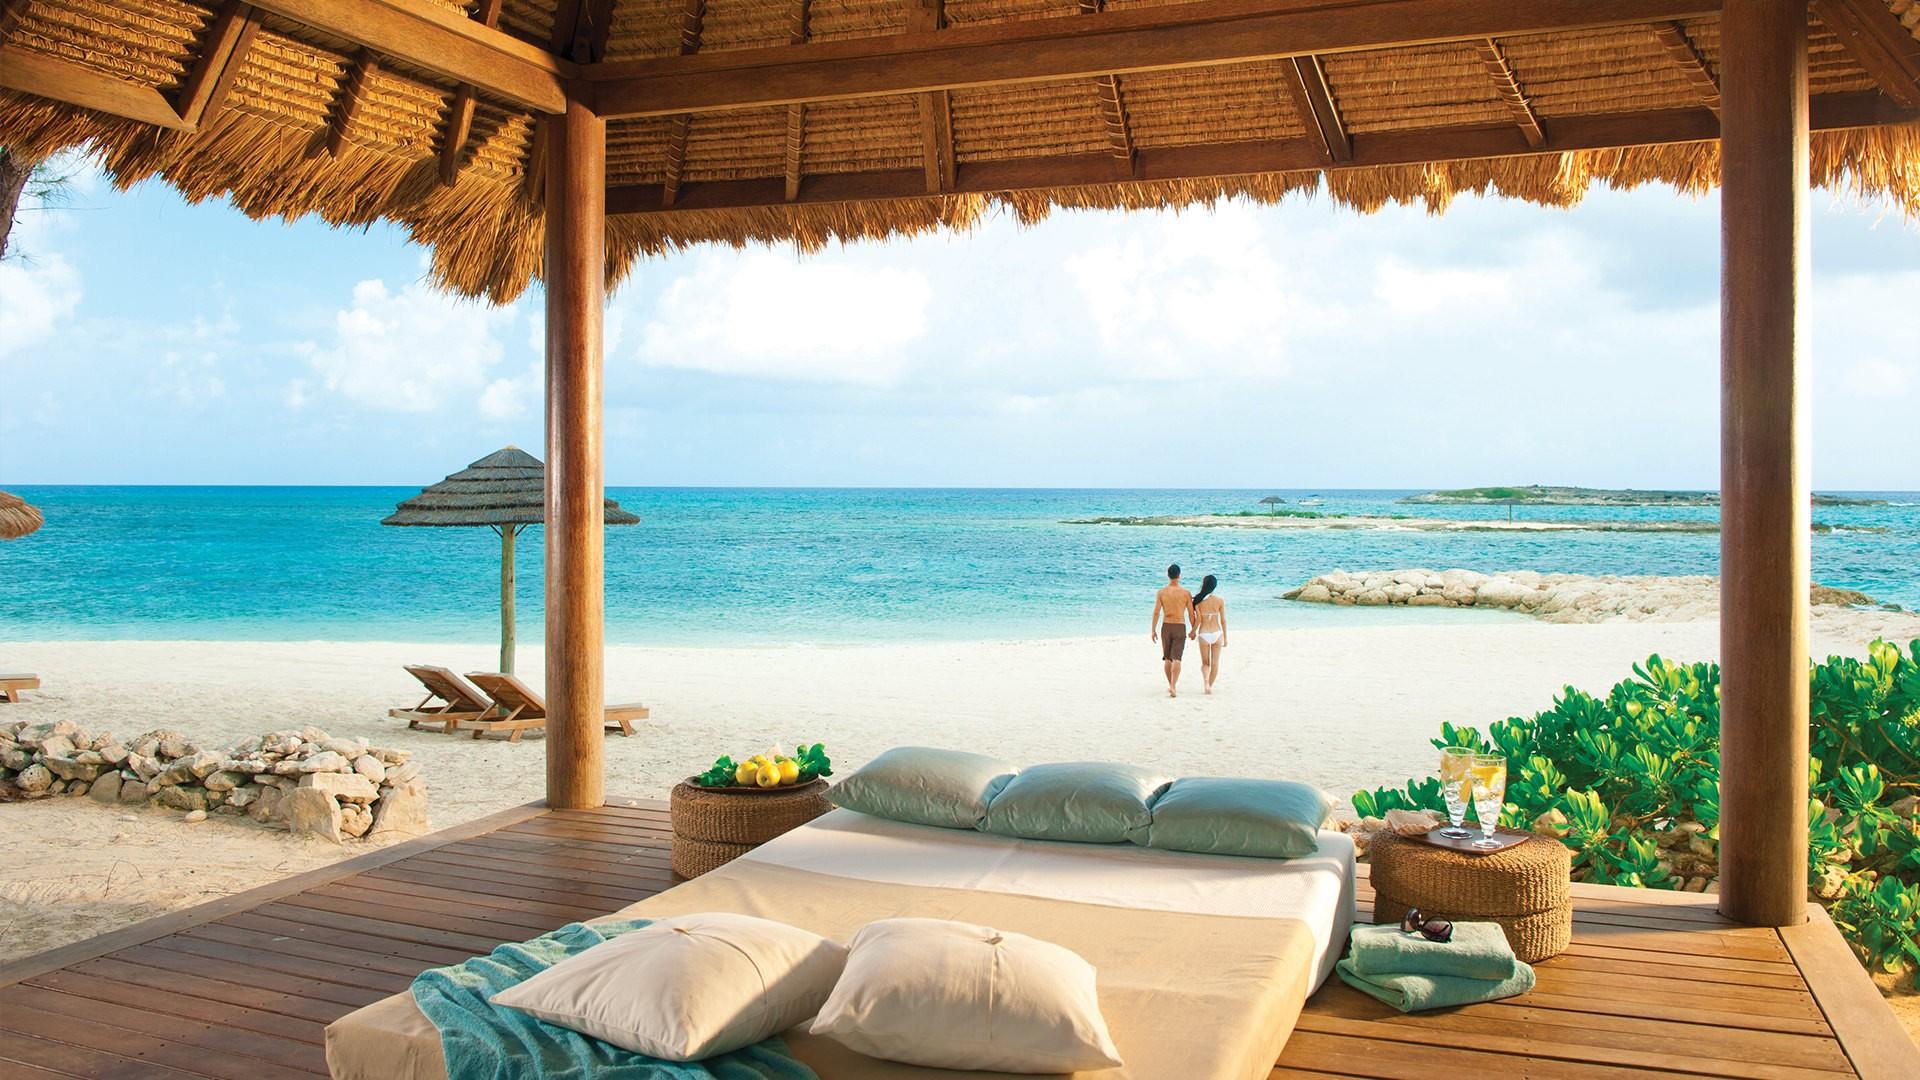 Beach-resorts-in-dubai